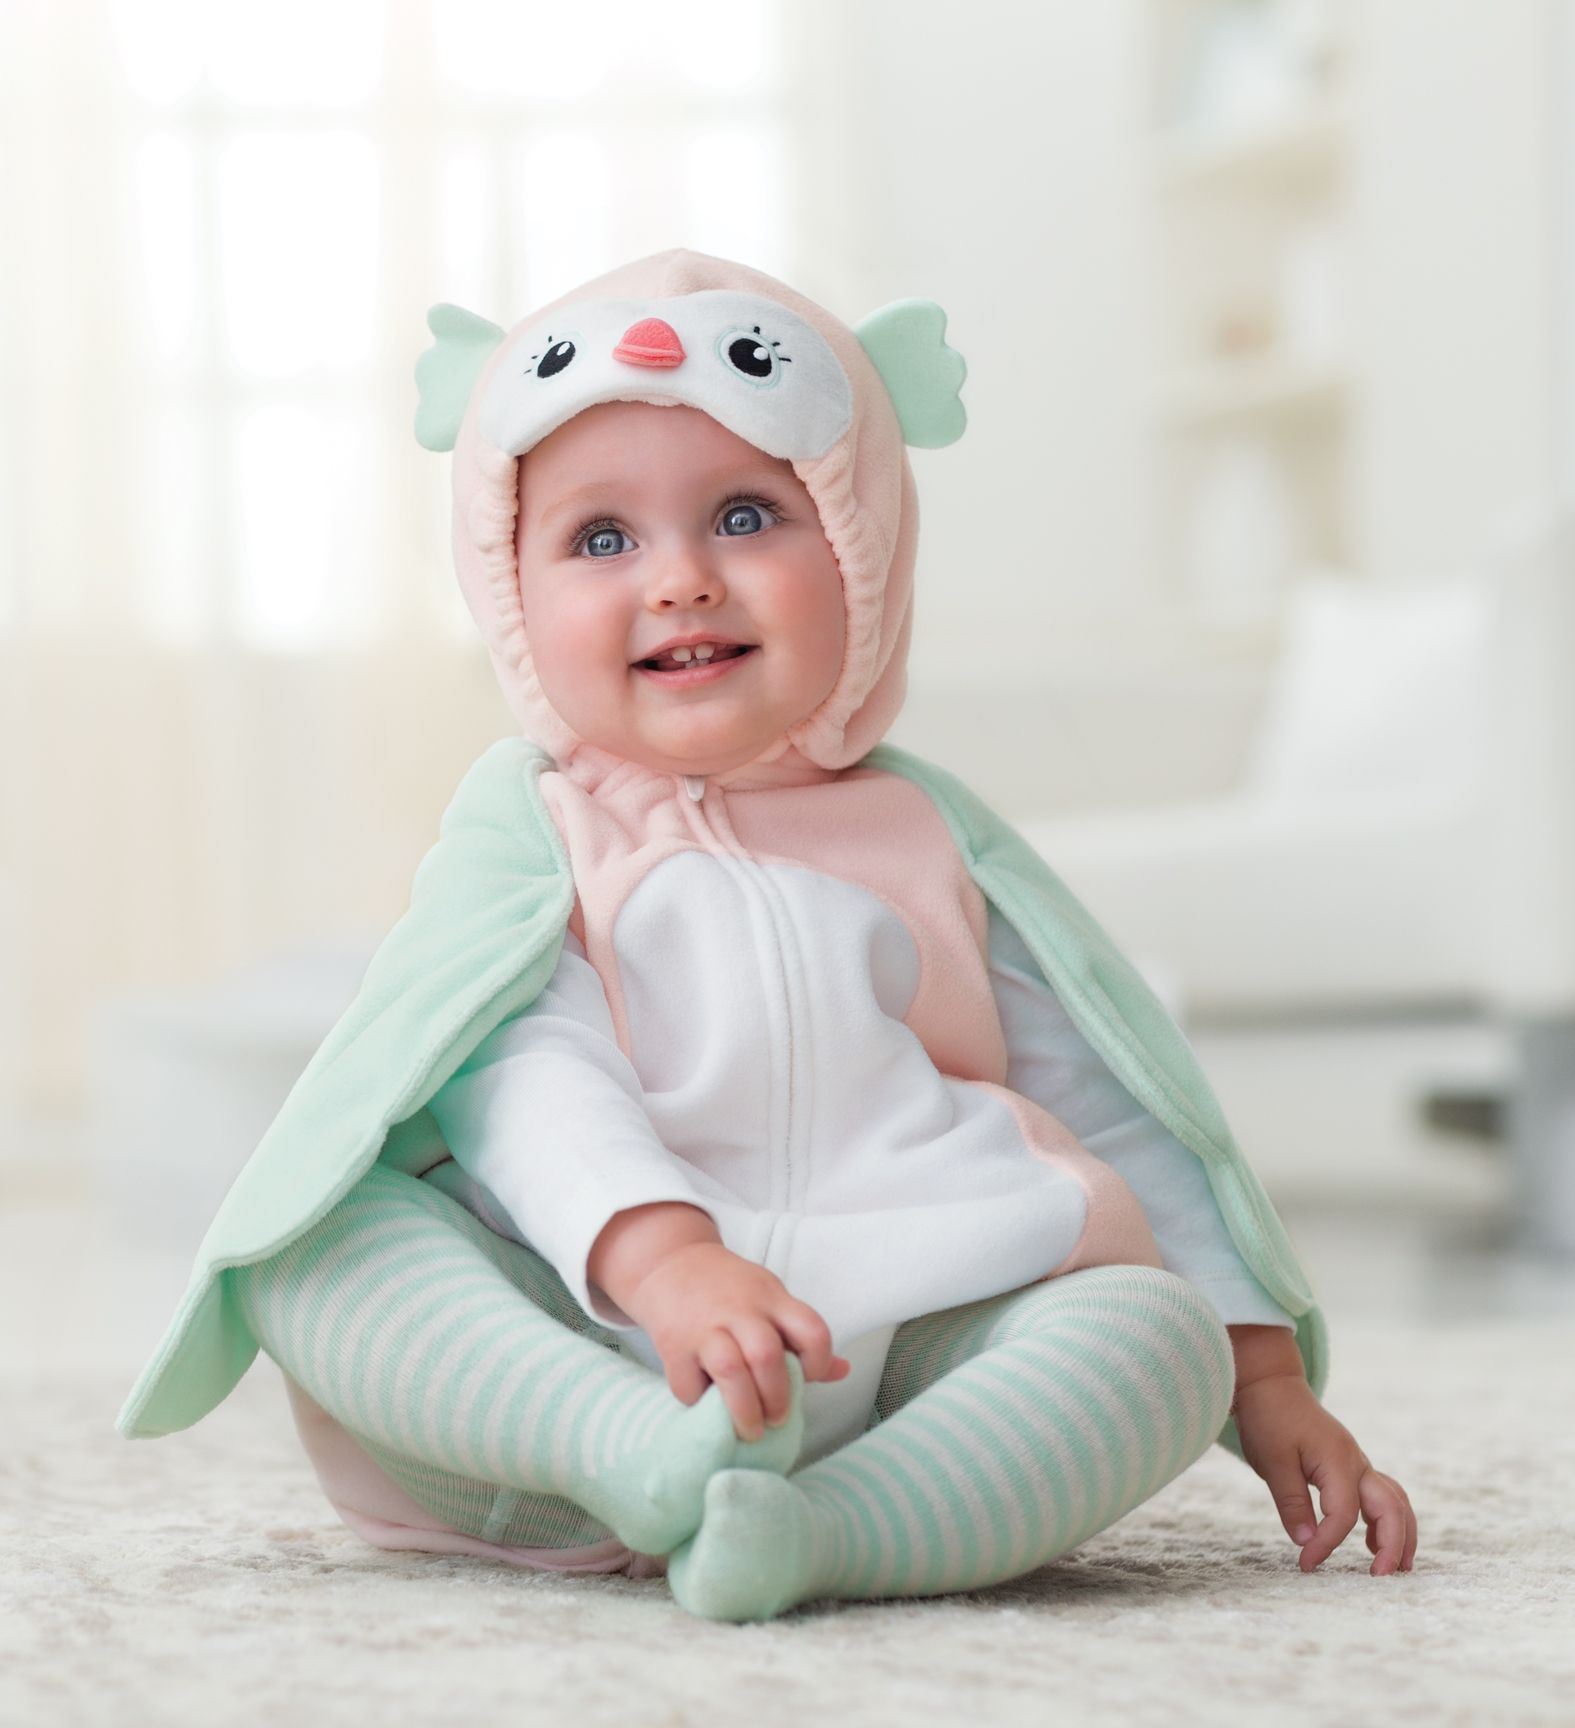 Little Owl Baby Halloween Costume #beallsflorida  sc 1 st  Pinterest & Little Owl Baby Halloween Costume #beallsflorida | Kids Dress and ...